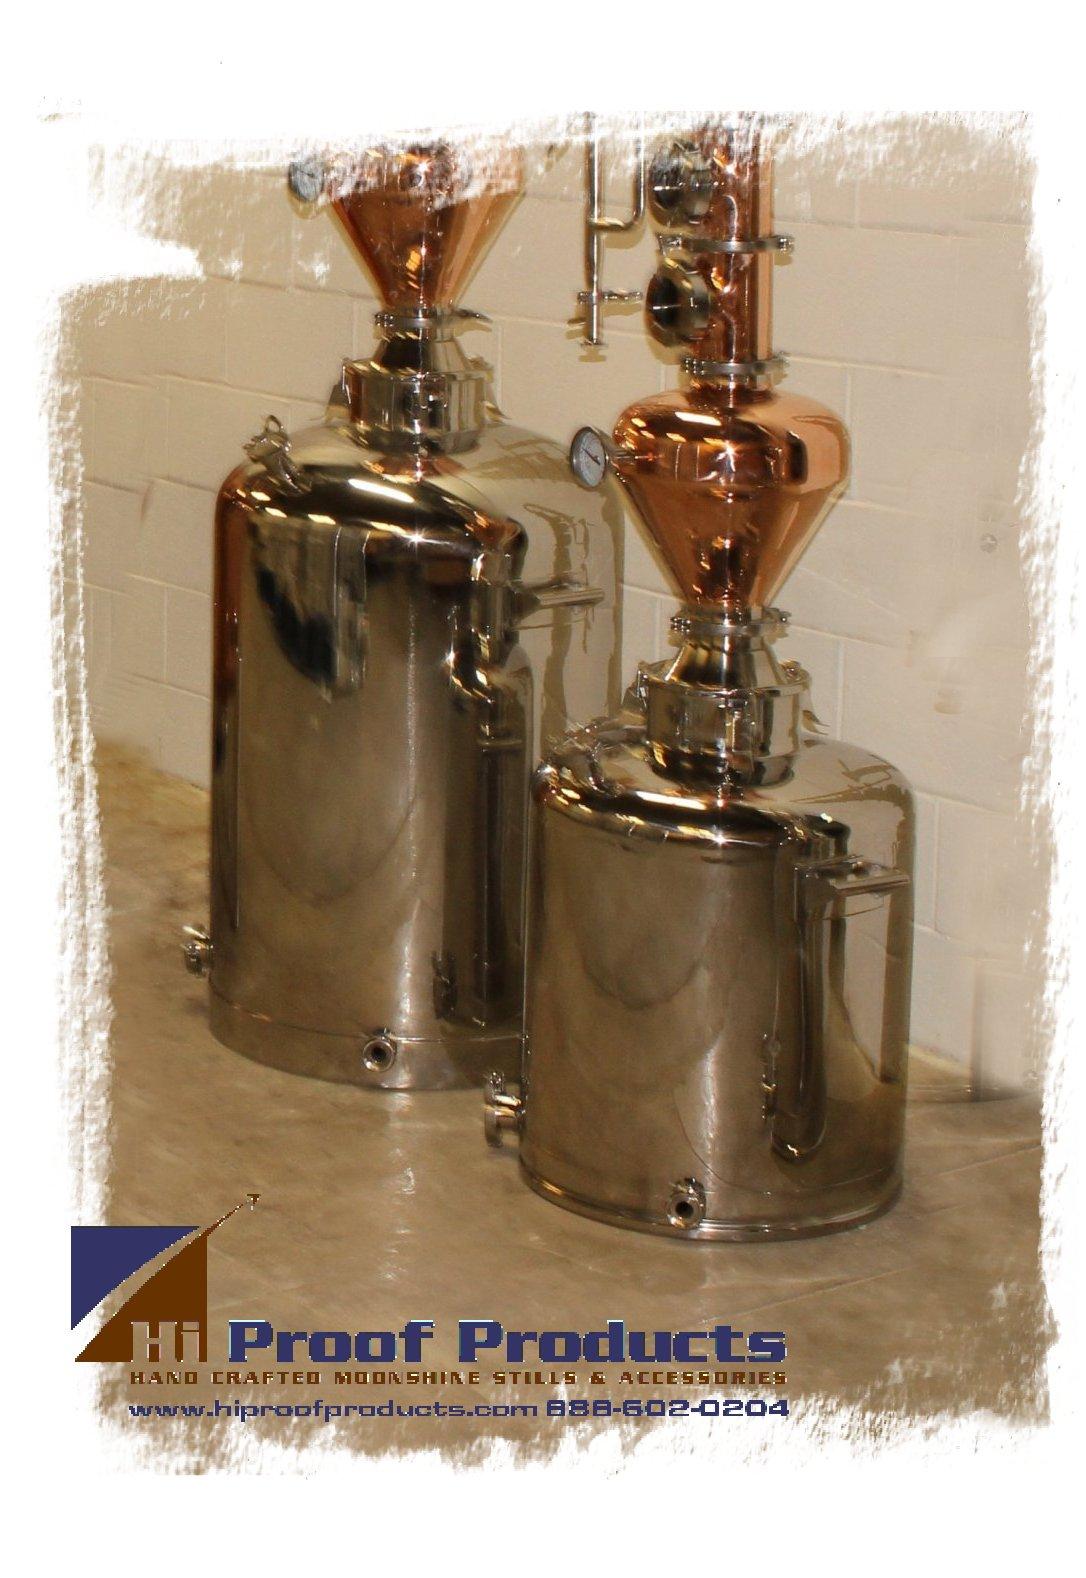 Copper Stills For Distillation Moonshine Still Diagram Images Pictures Becuo